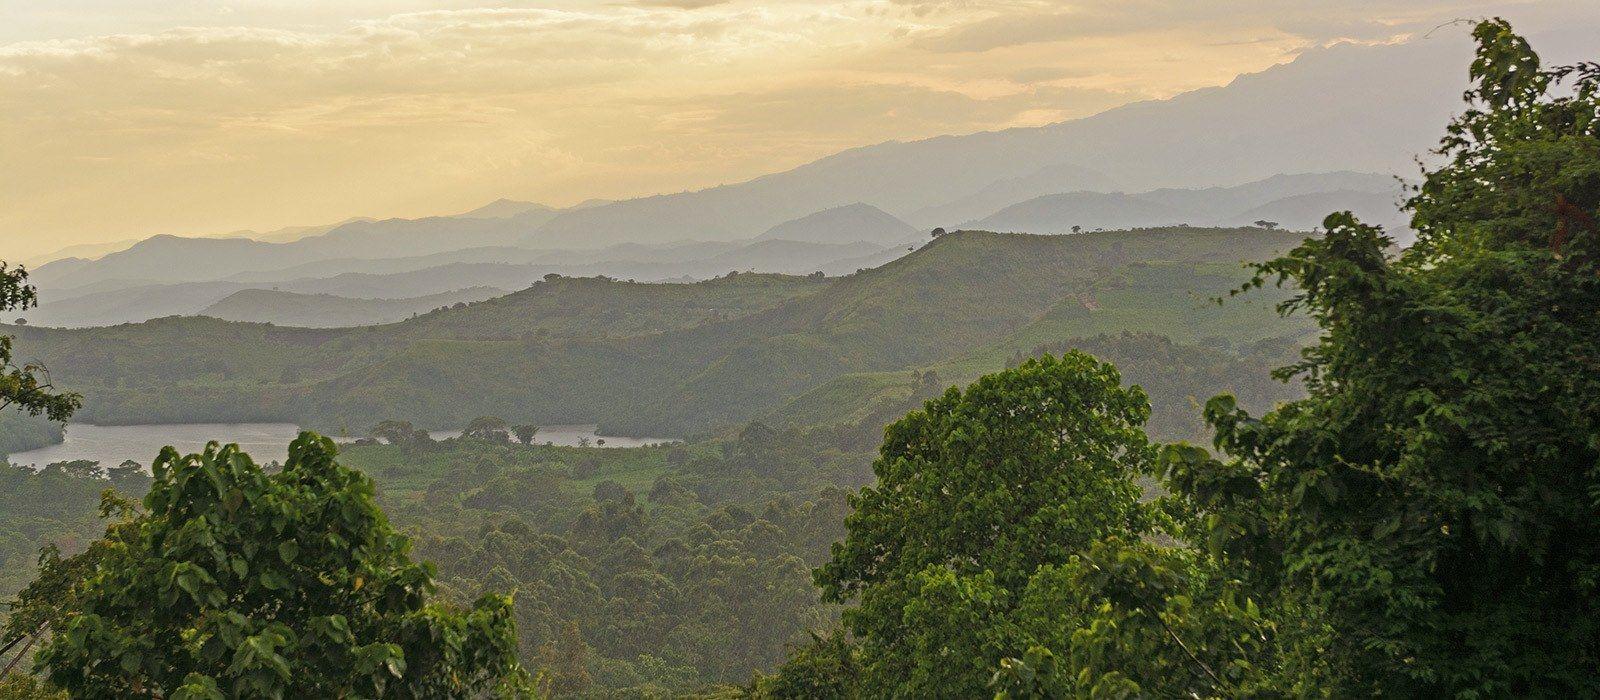 Destination Rwenzoris Uganda